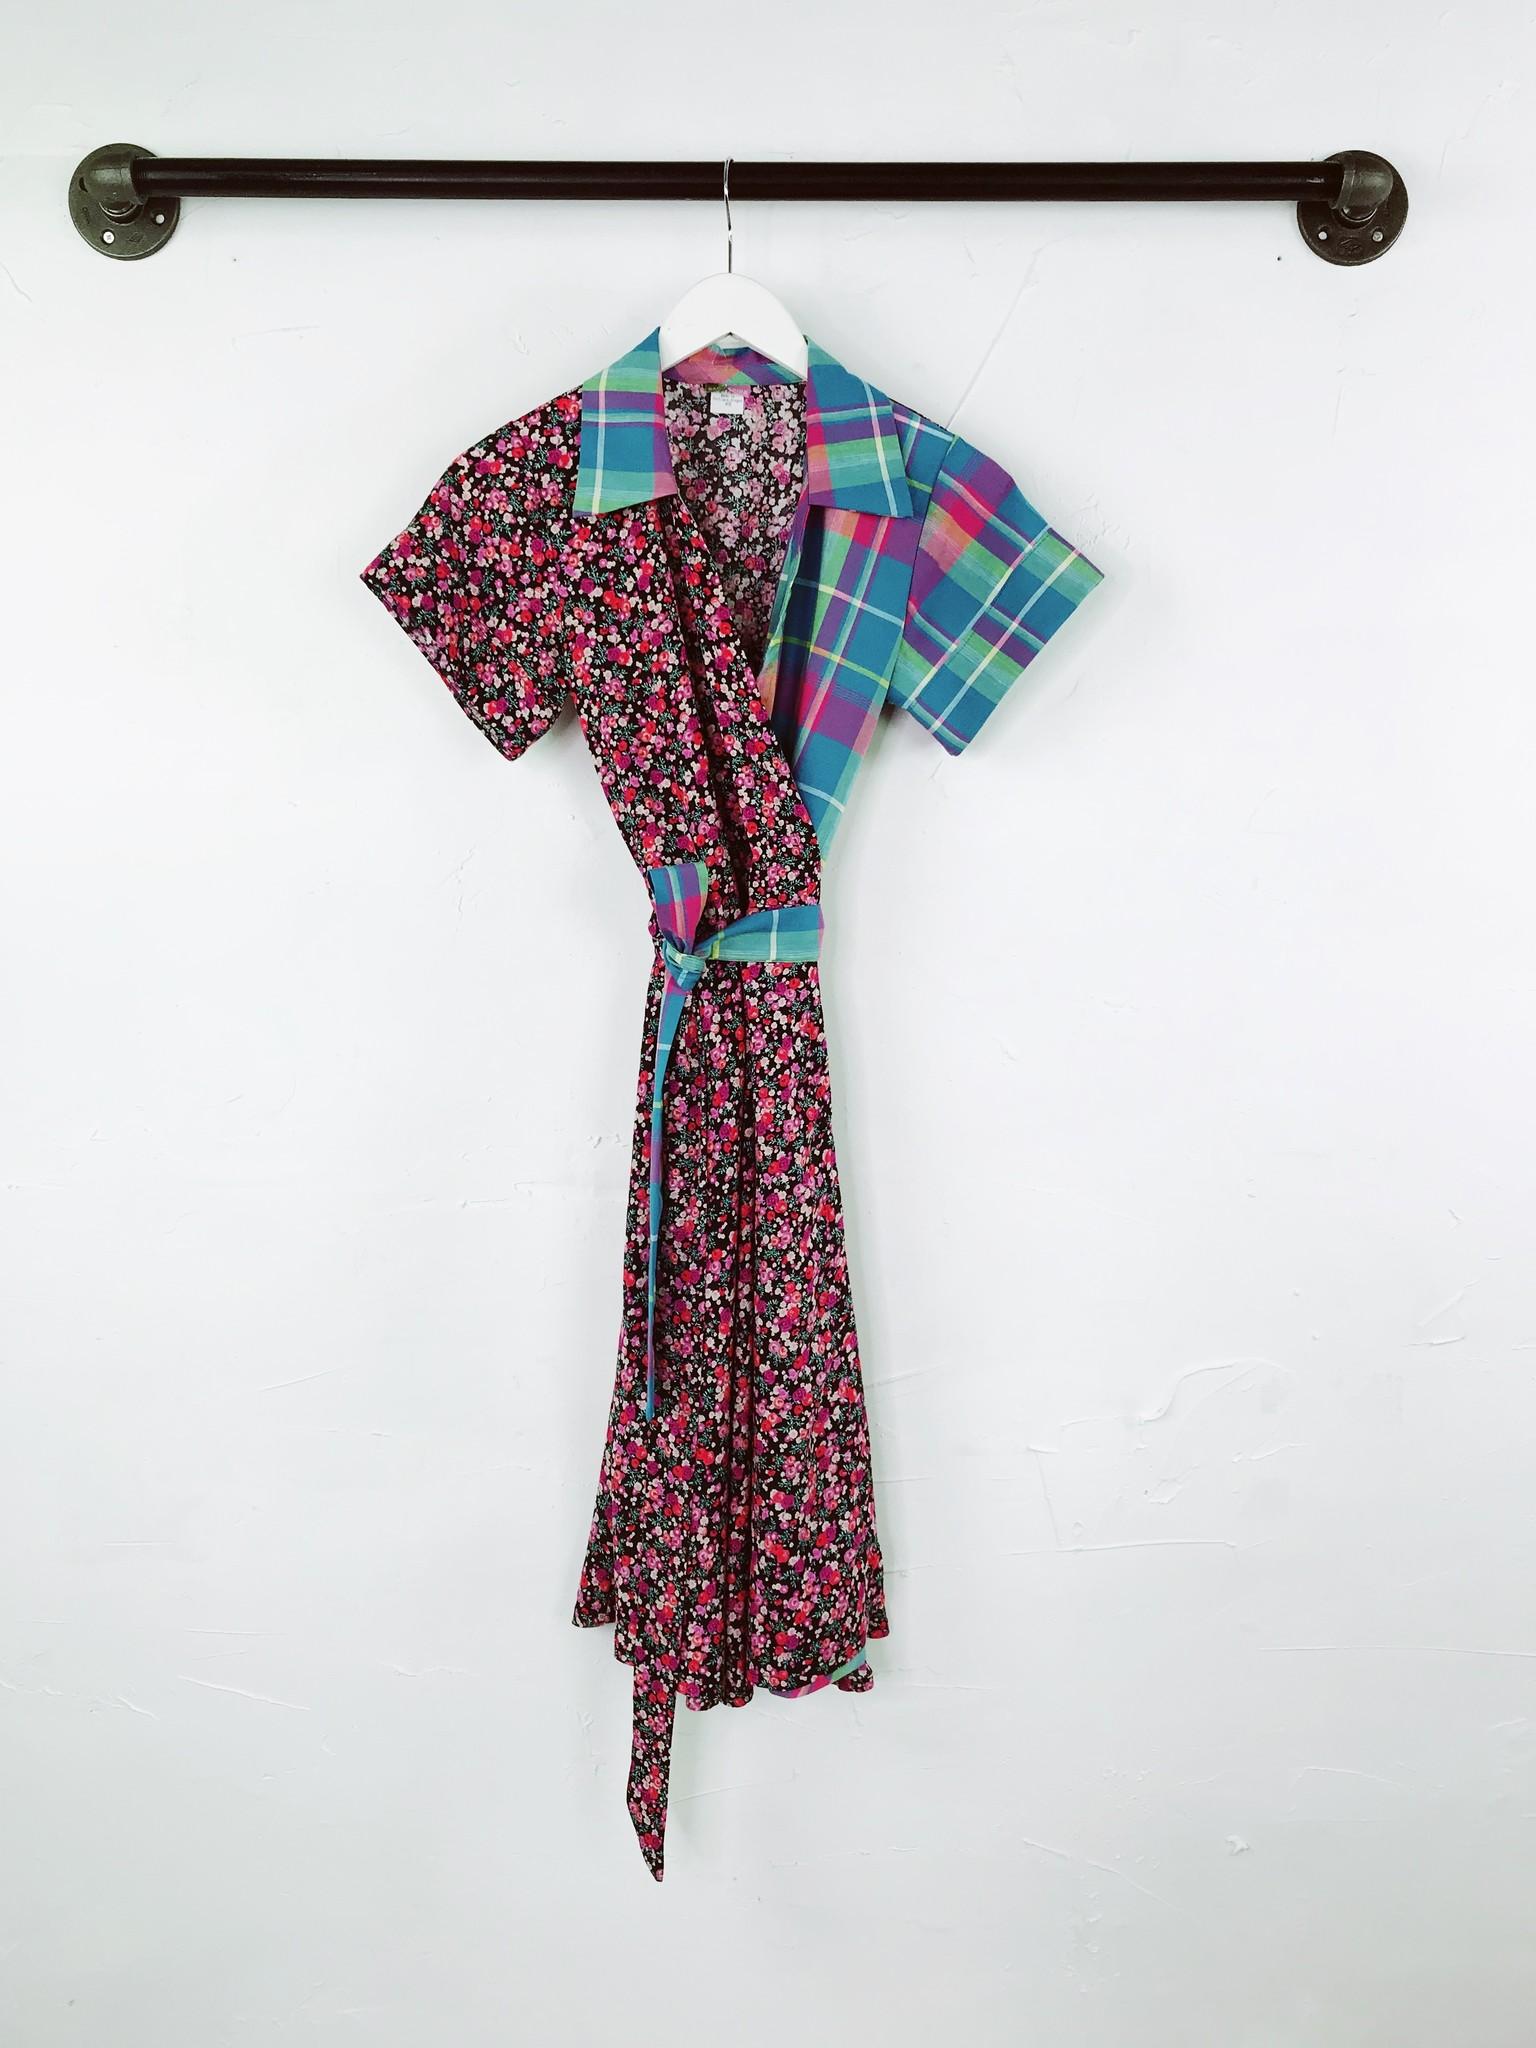 Sarah Bibb Tootie Wrap Dress - Madras/Scape